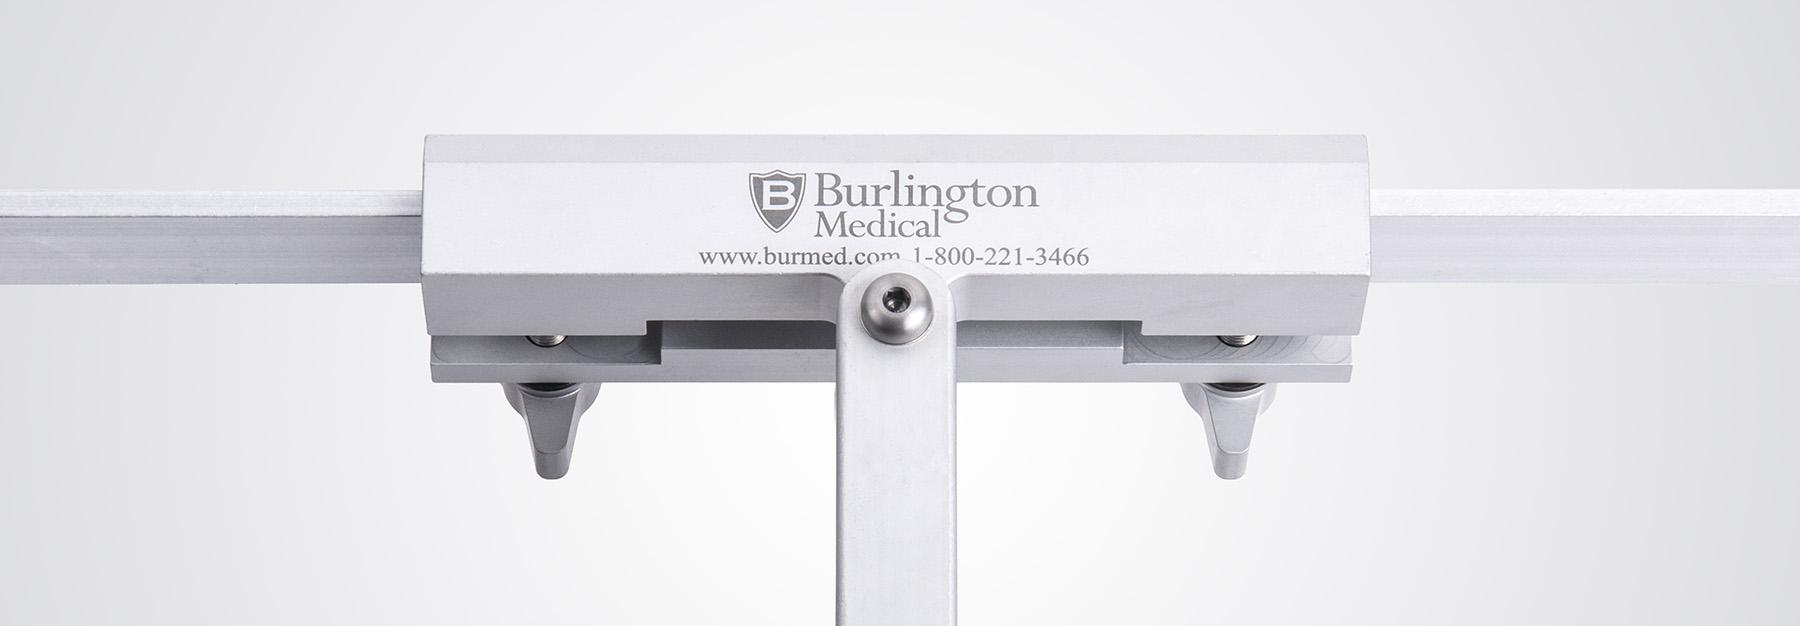 tektonics burlington medical banner.jpg